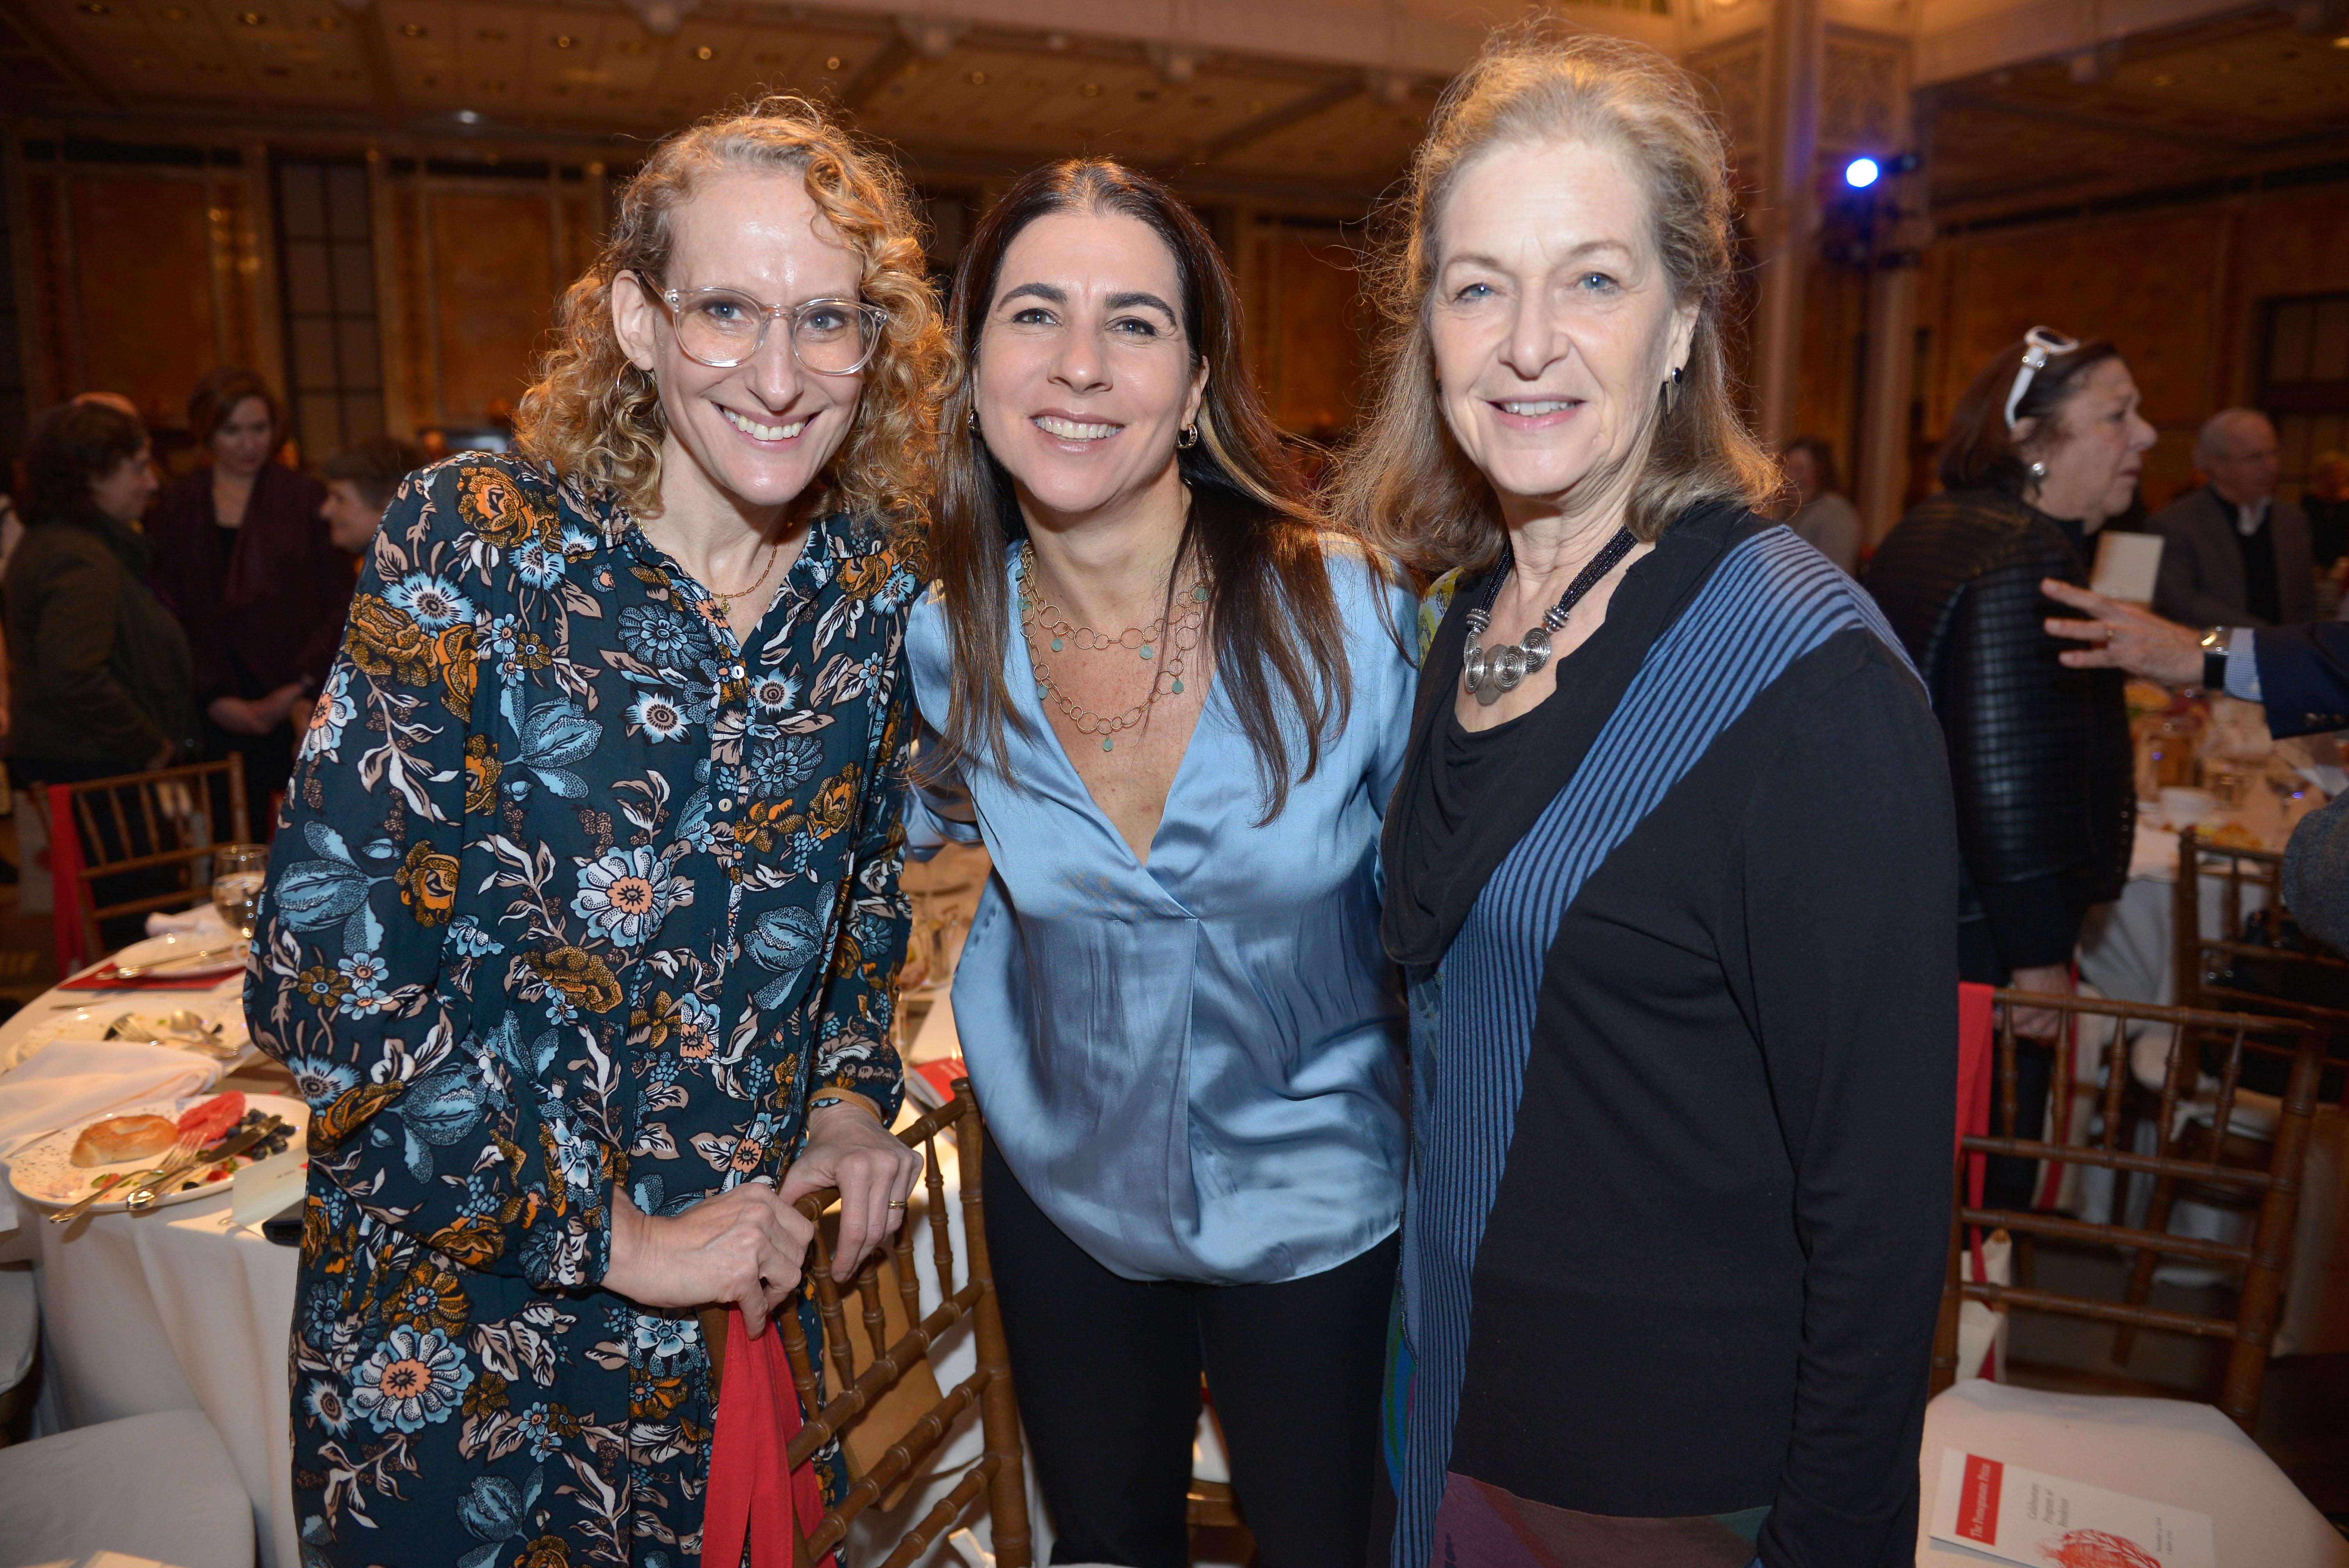 From left: Angie Lieber, 2016 Covenant Award Recipient Ilana Ruskay-Kidd, and Arnee Winshall.